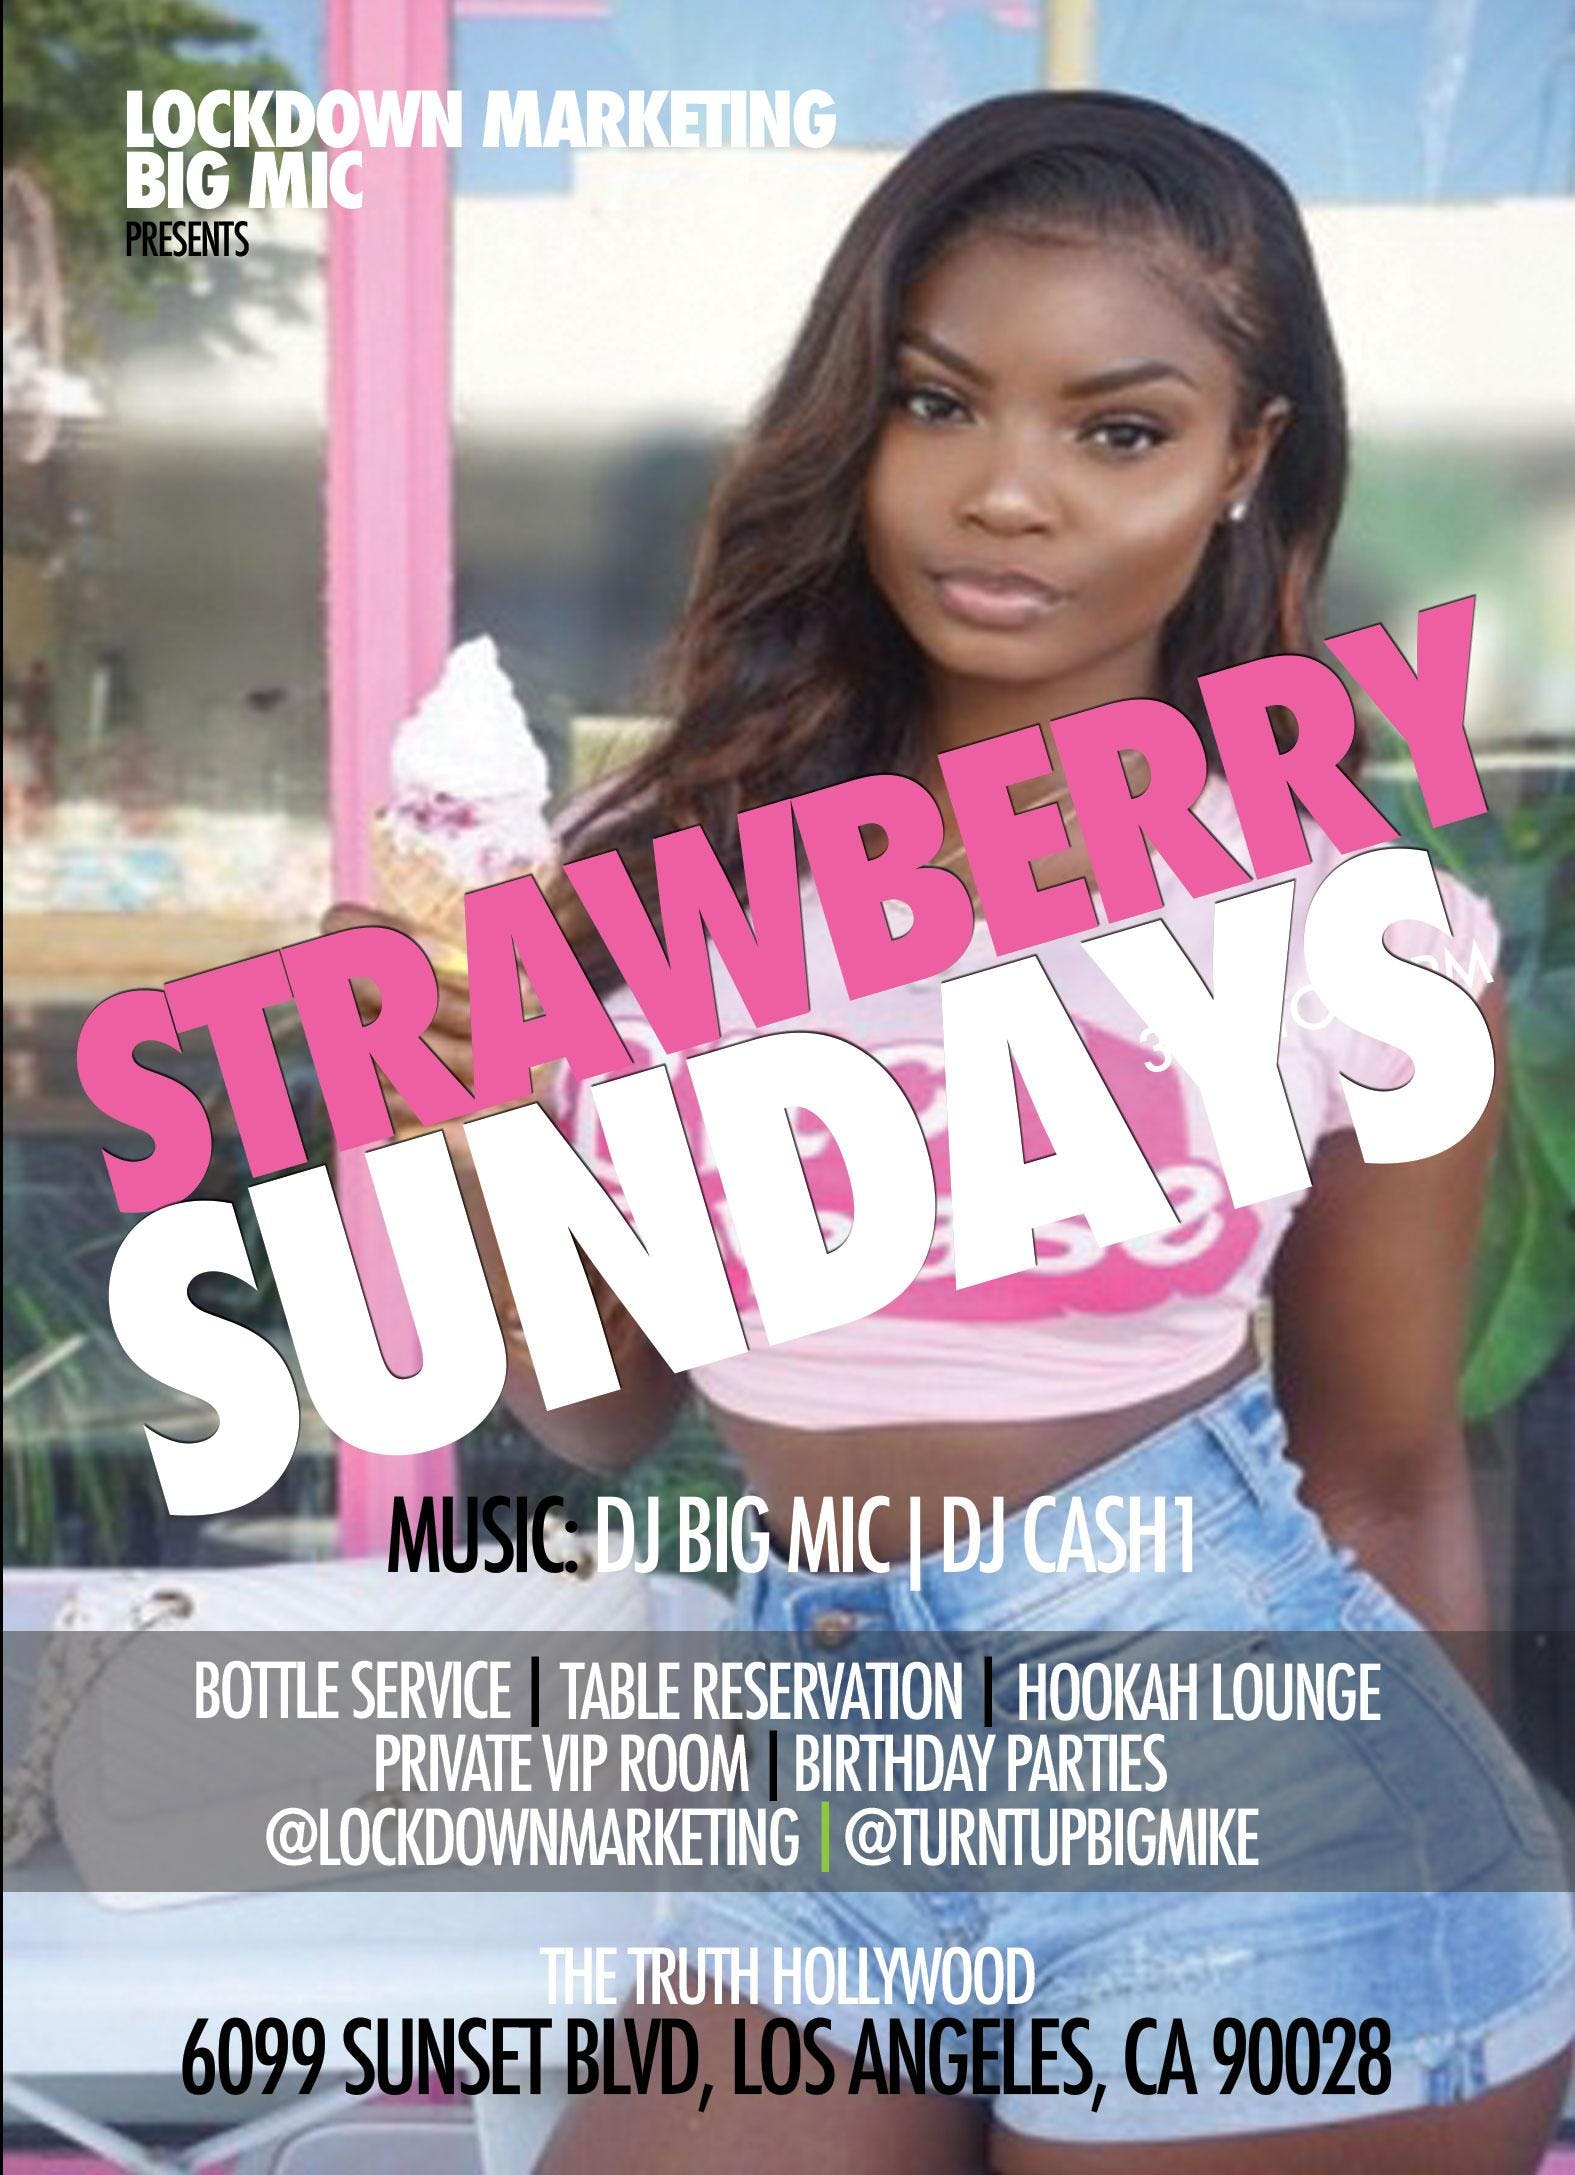 Strawberry Sundays